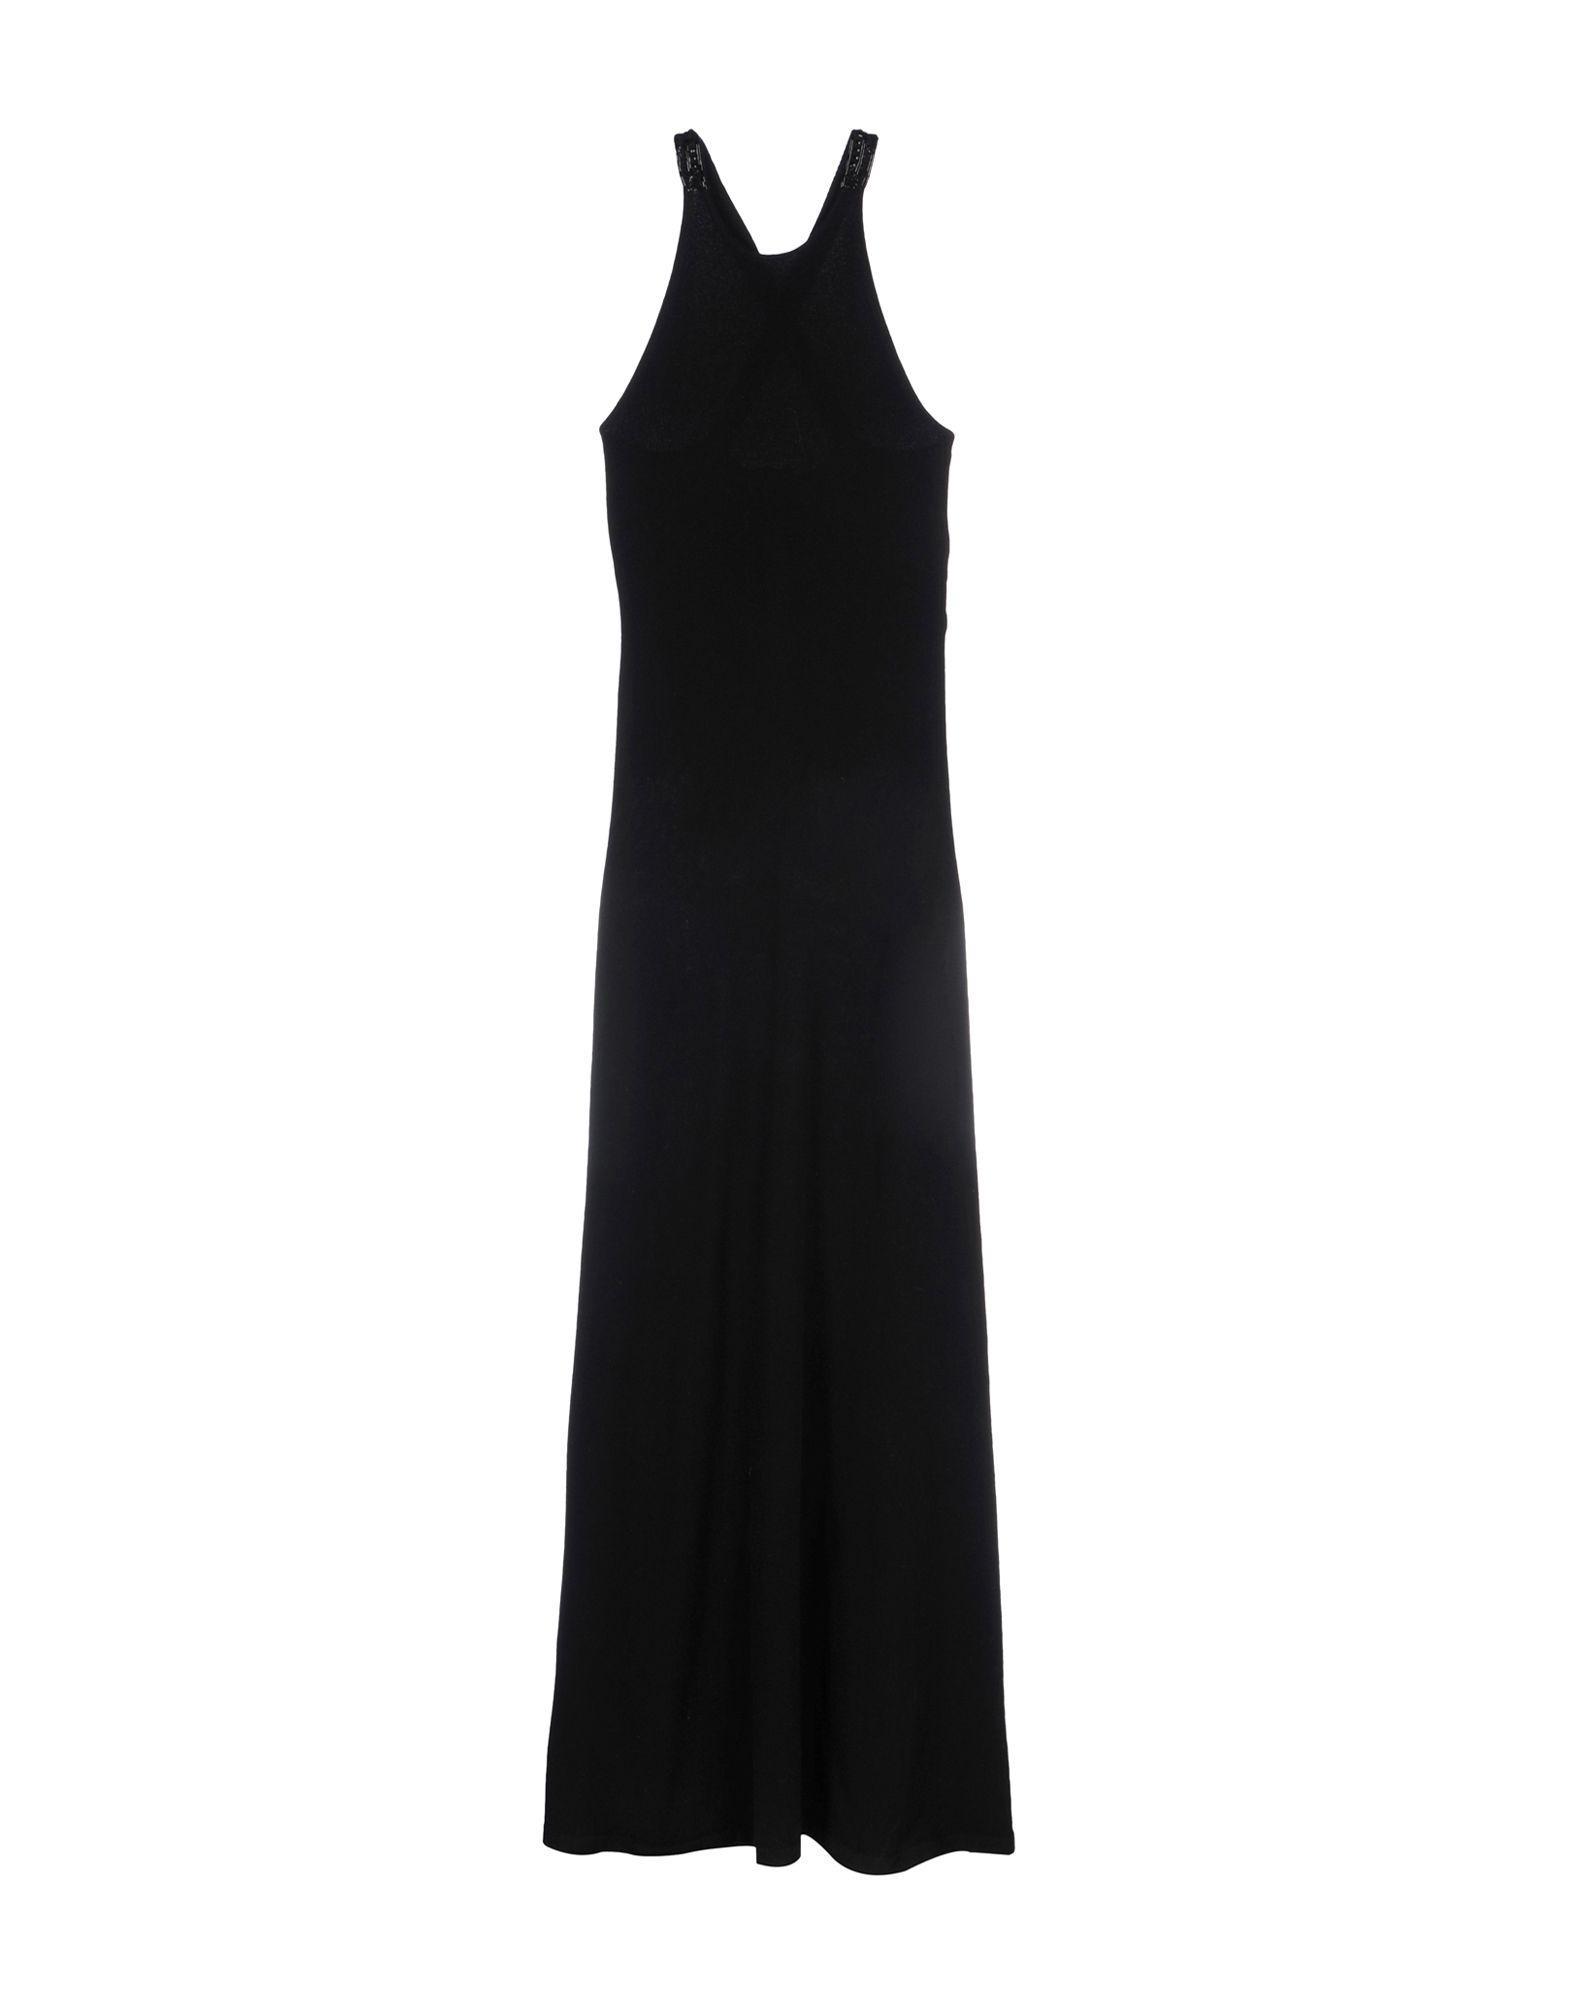 RALPH LAUREN BLACK LABEL Длинное платье ralph lauren black label платье длиной 3 4